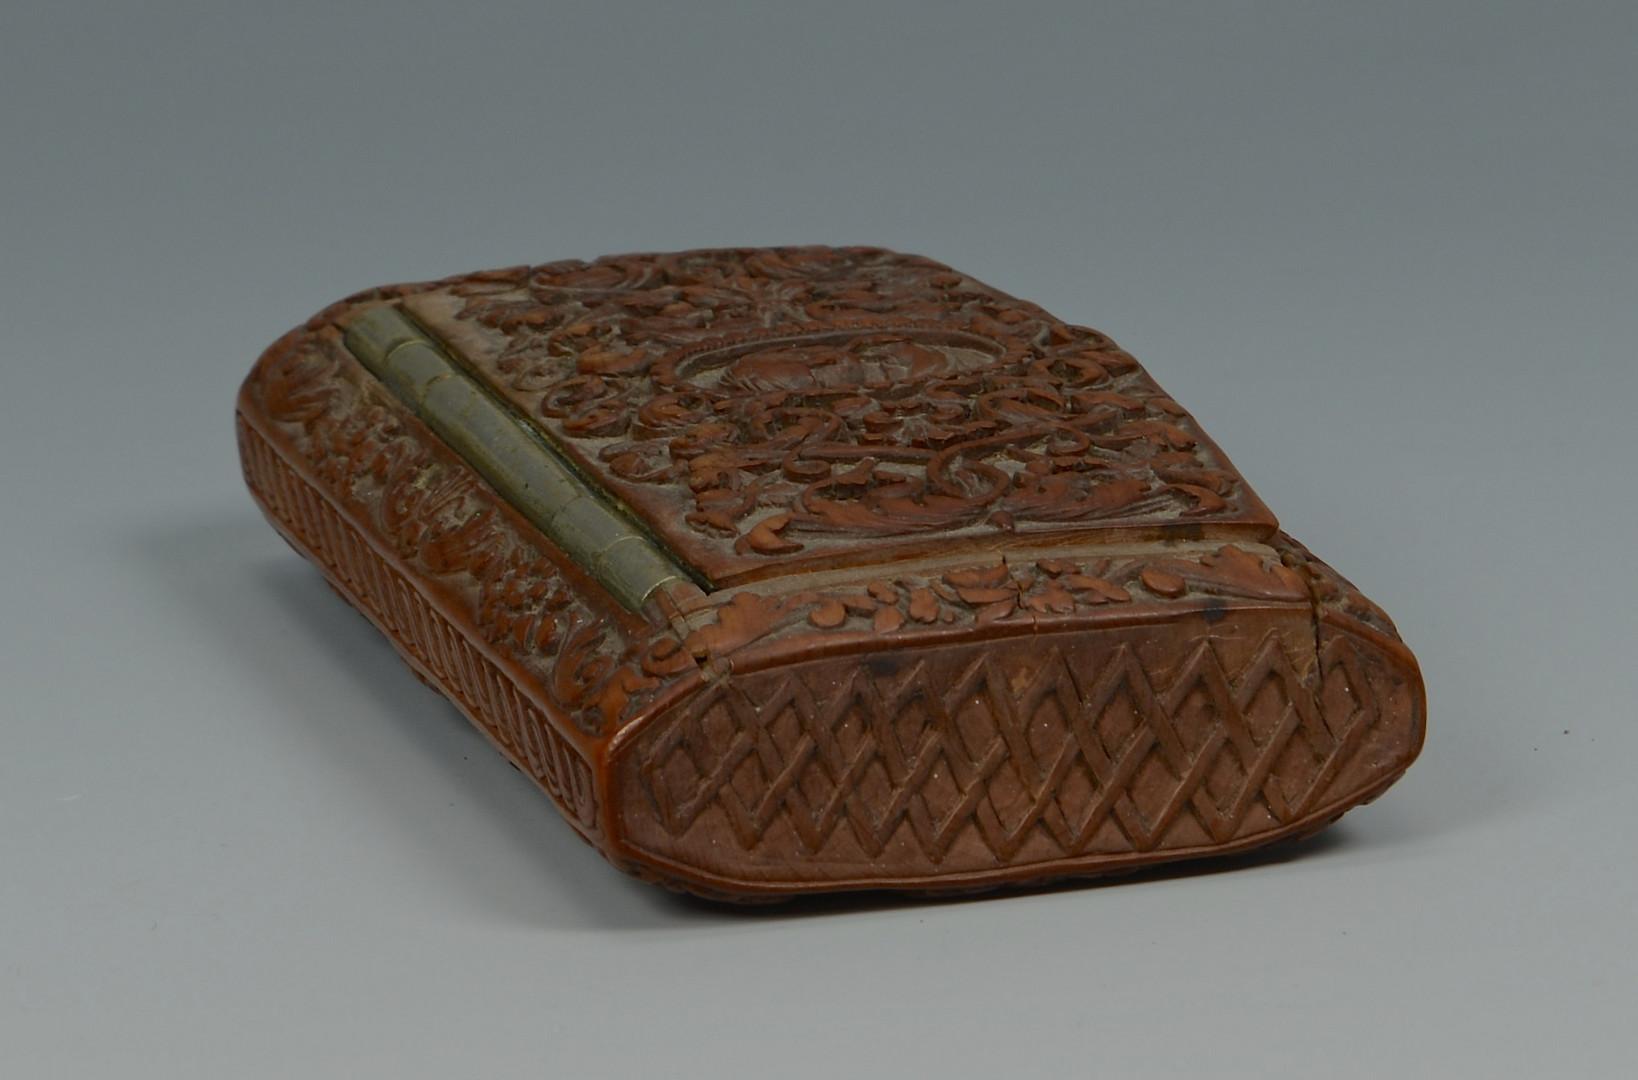 Lot 352: Carved Wood Snuff Box